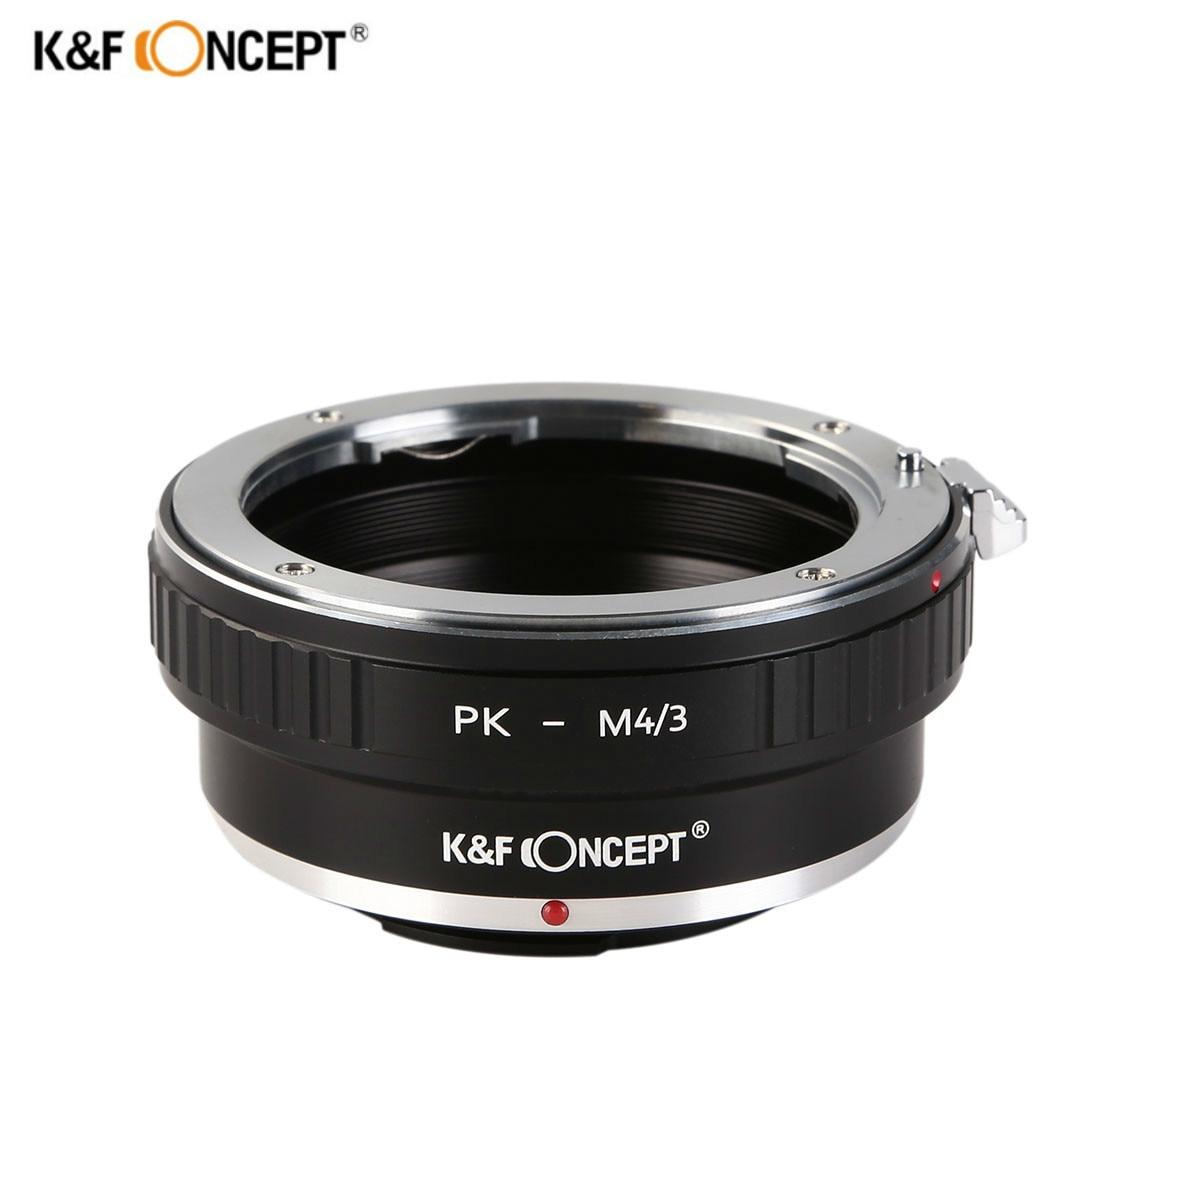 K & F CONCEPT Lens Mount Adapter Ring pour Pentax K PK Lens pour Olympus Panasonic Micro 4/3 M4/ 3 Mount Adapter G10 G3 GF3 GF1